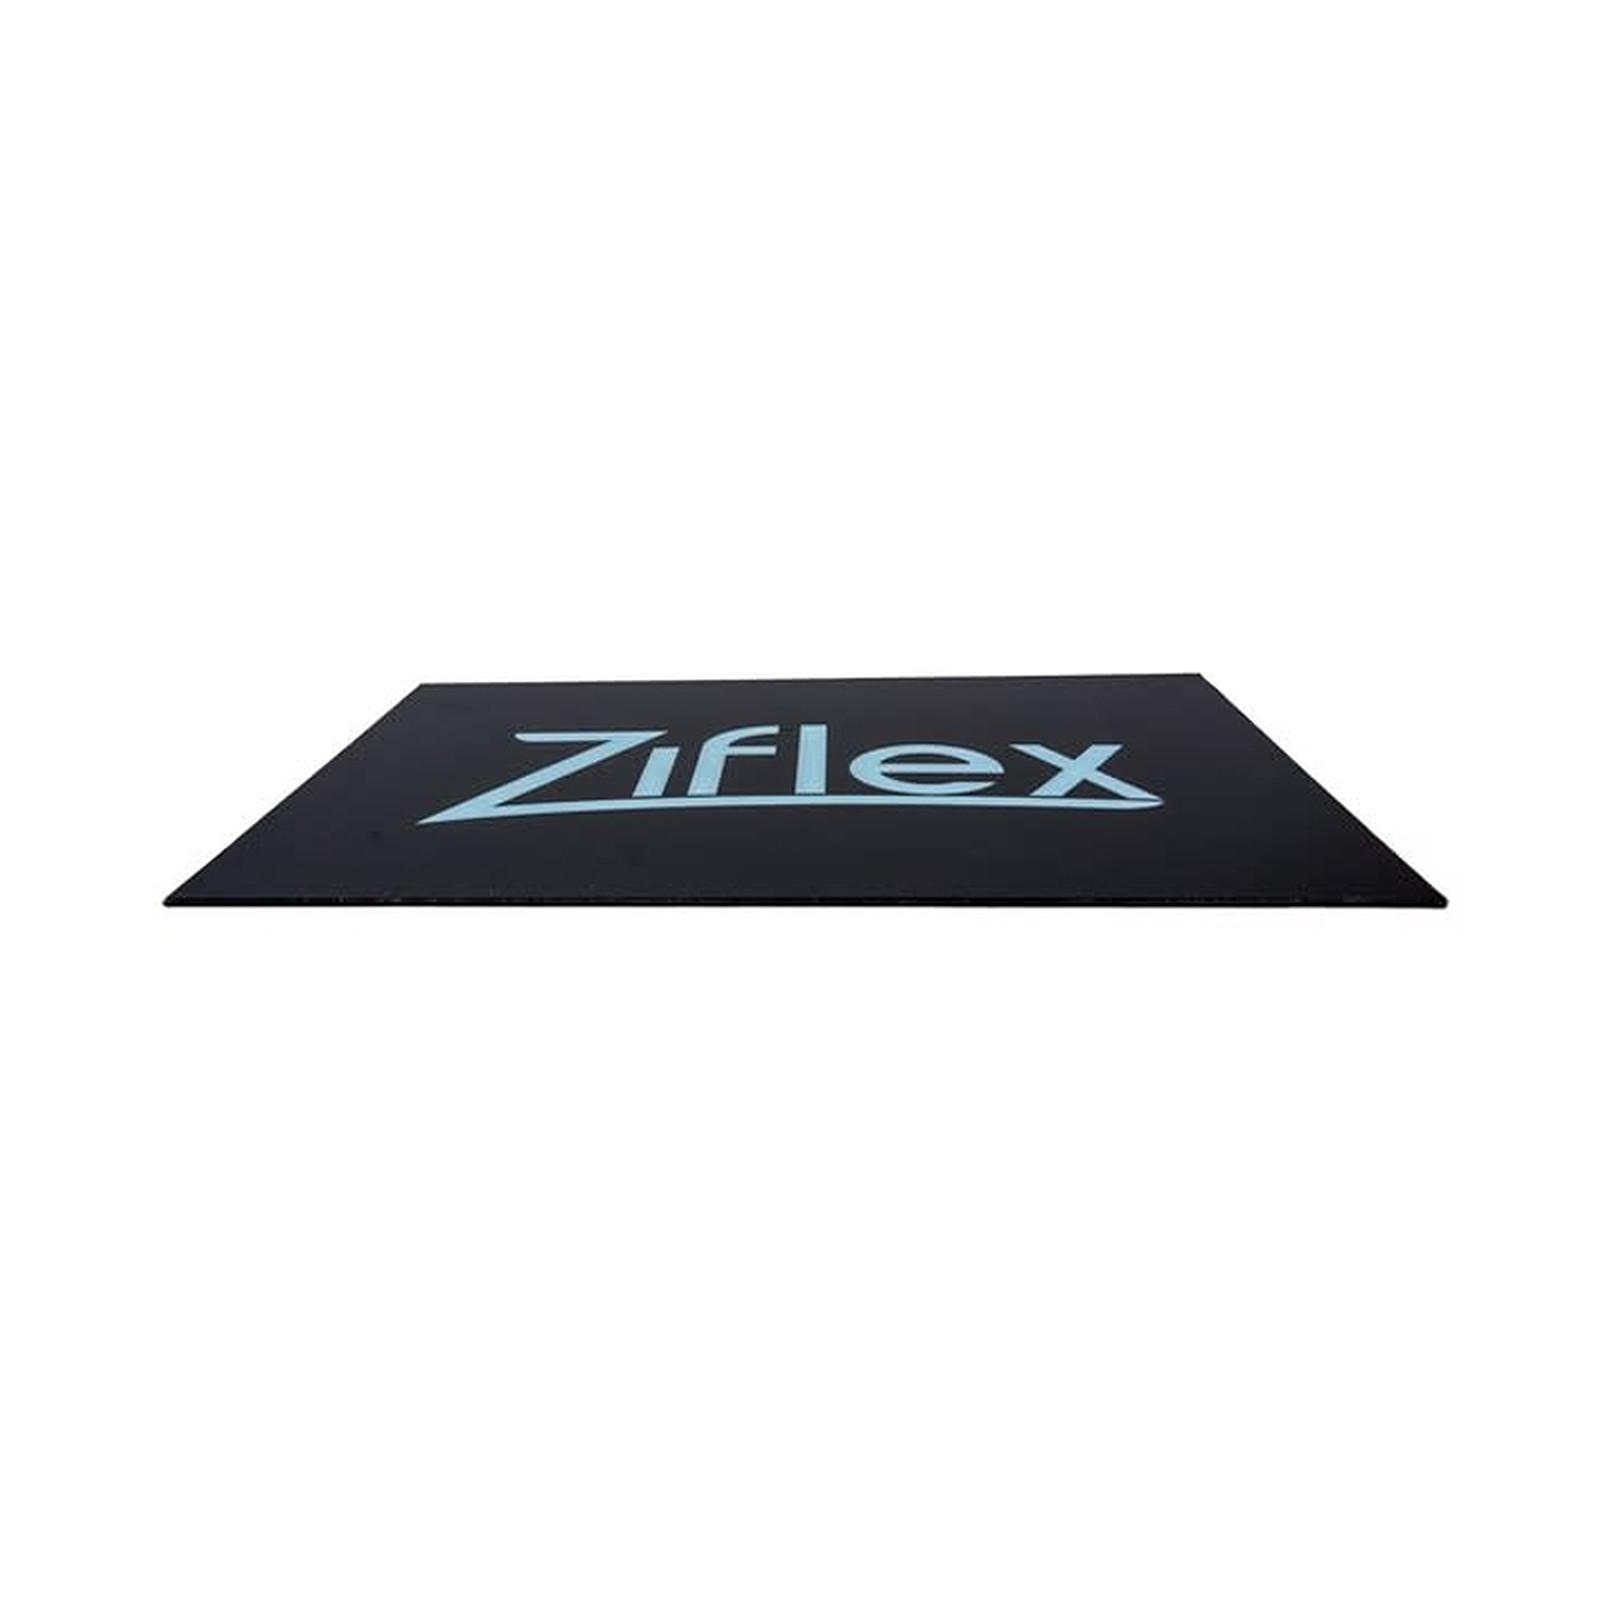 Zimple Ziflex Flashforge